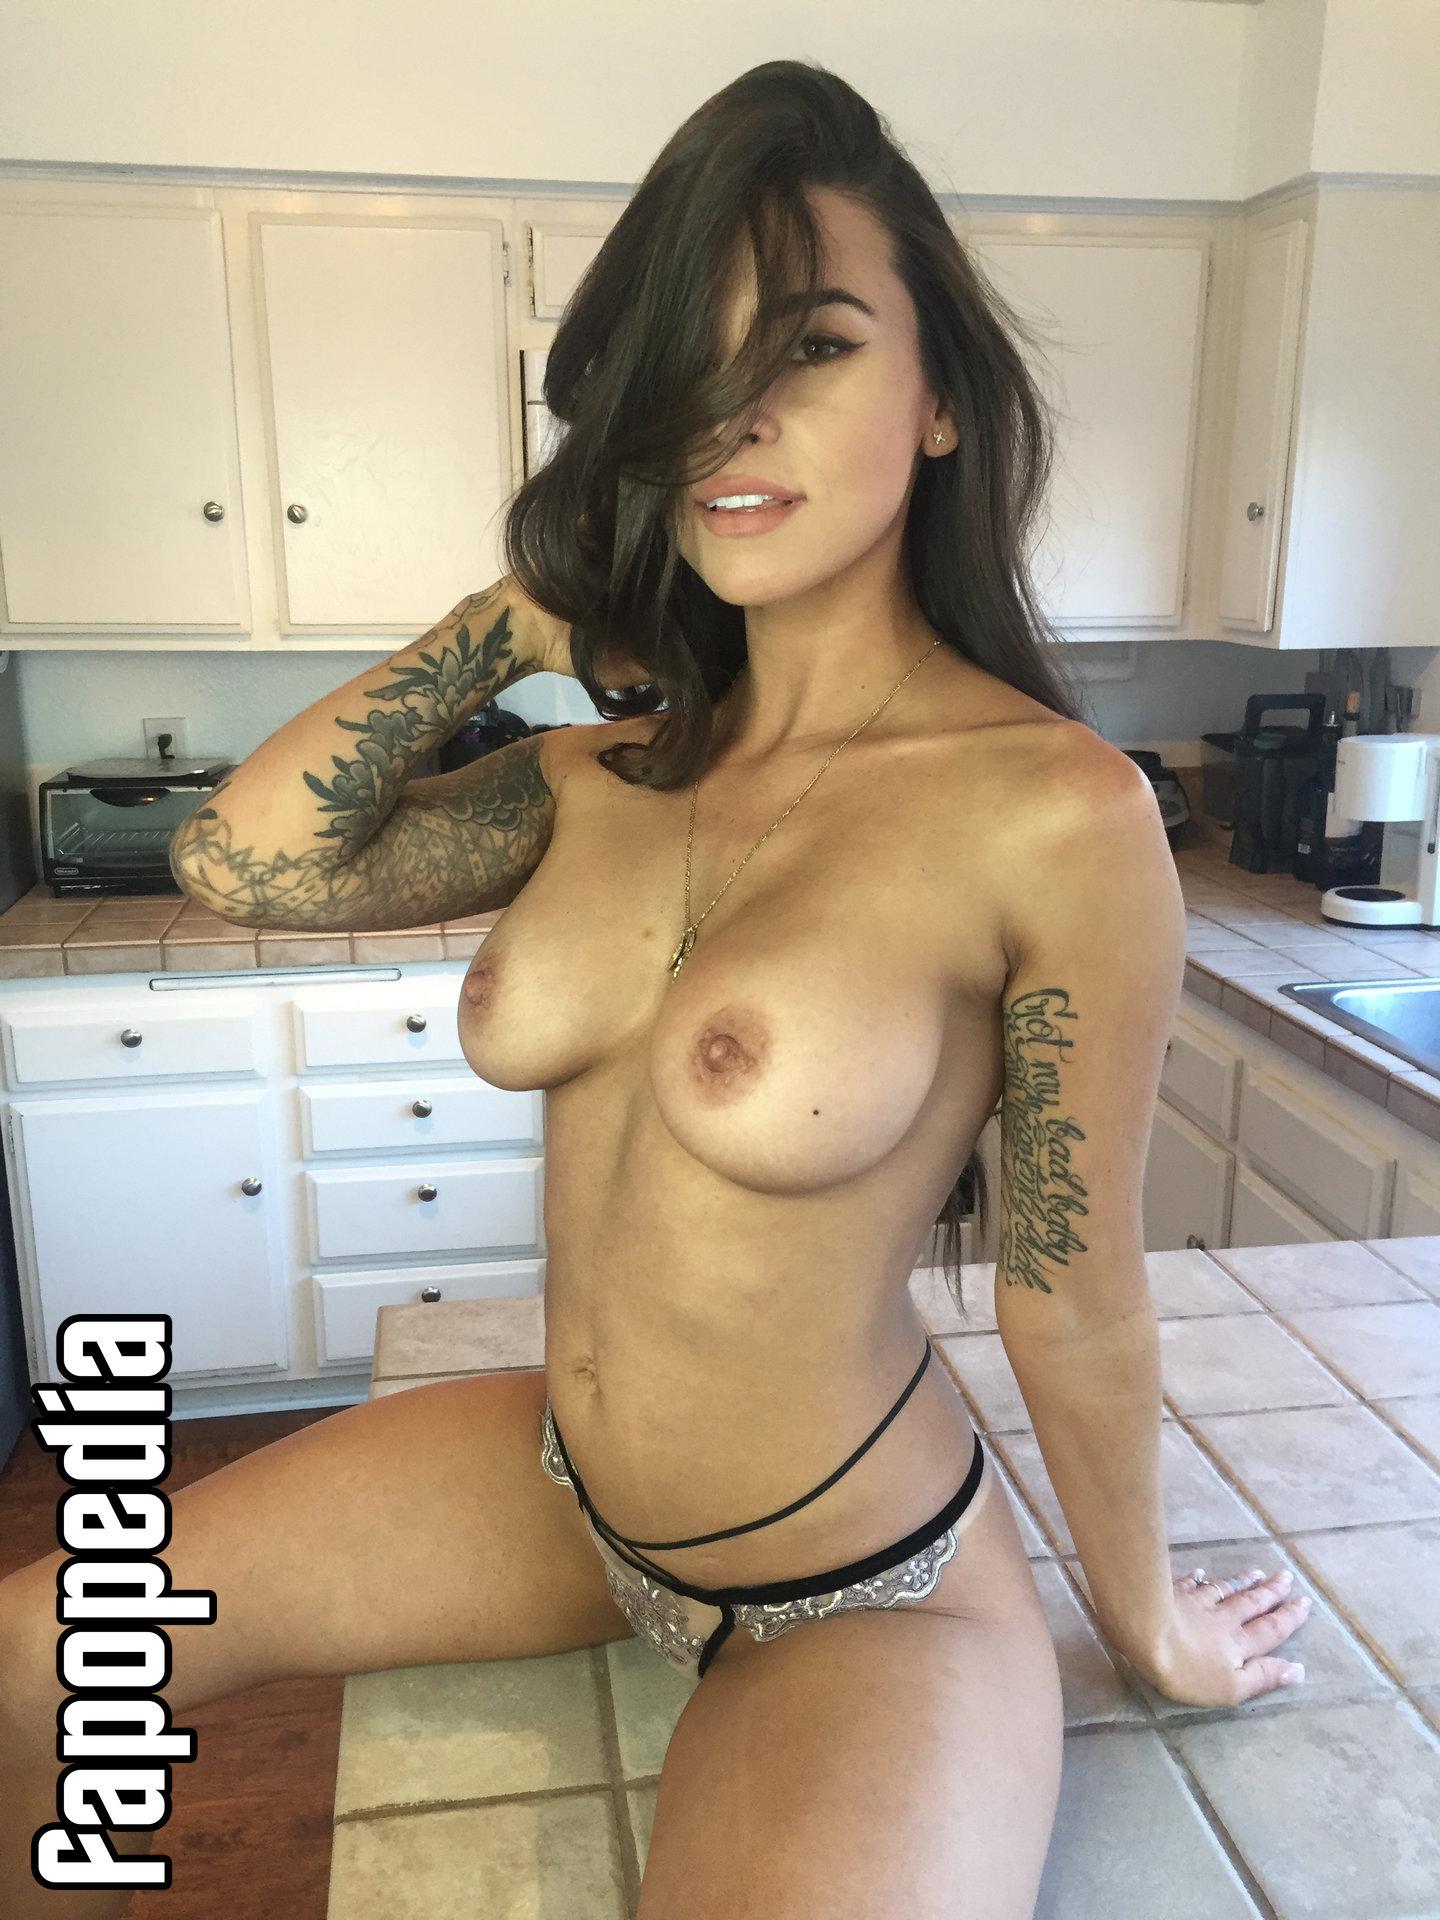 AdamsAperture Nude OnlyFans Leaks Patreon Leaks